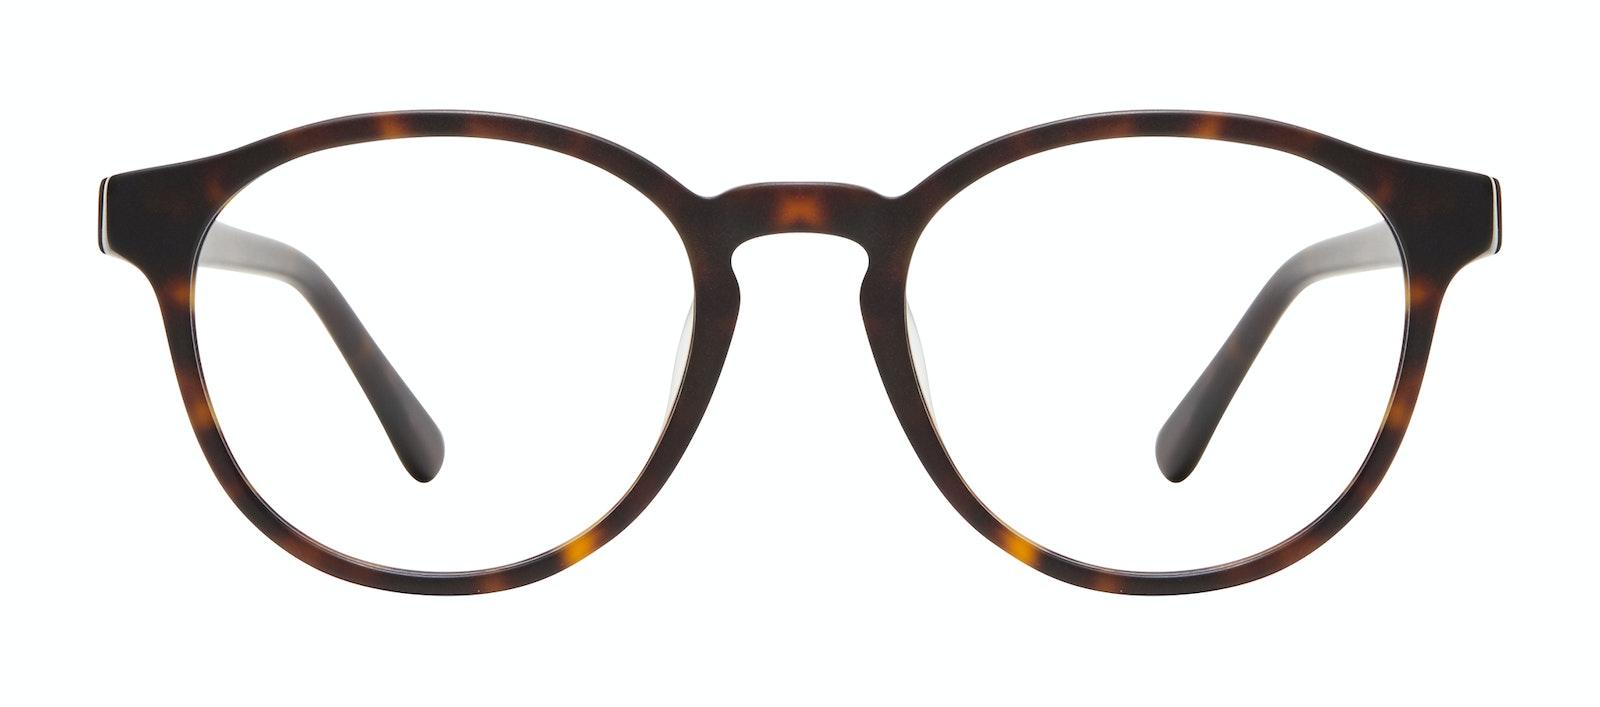 Affordable Fashion Glasses Round Eyeglasses Men Aussie Matte Tortoise Front